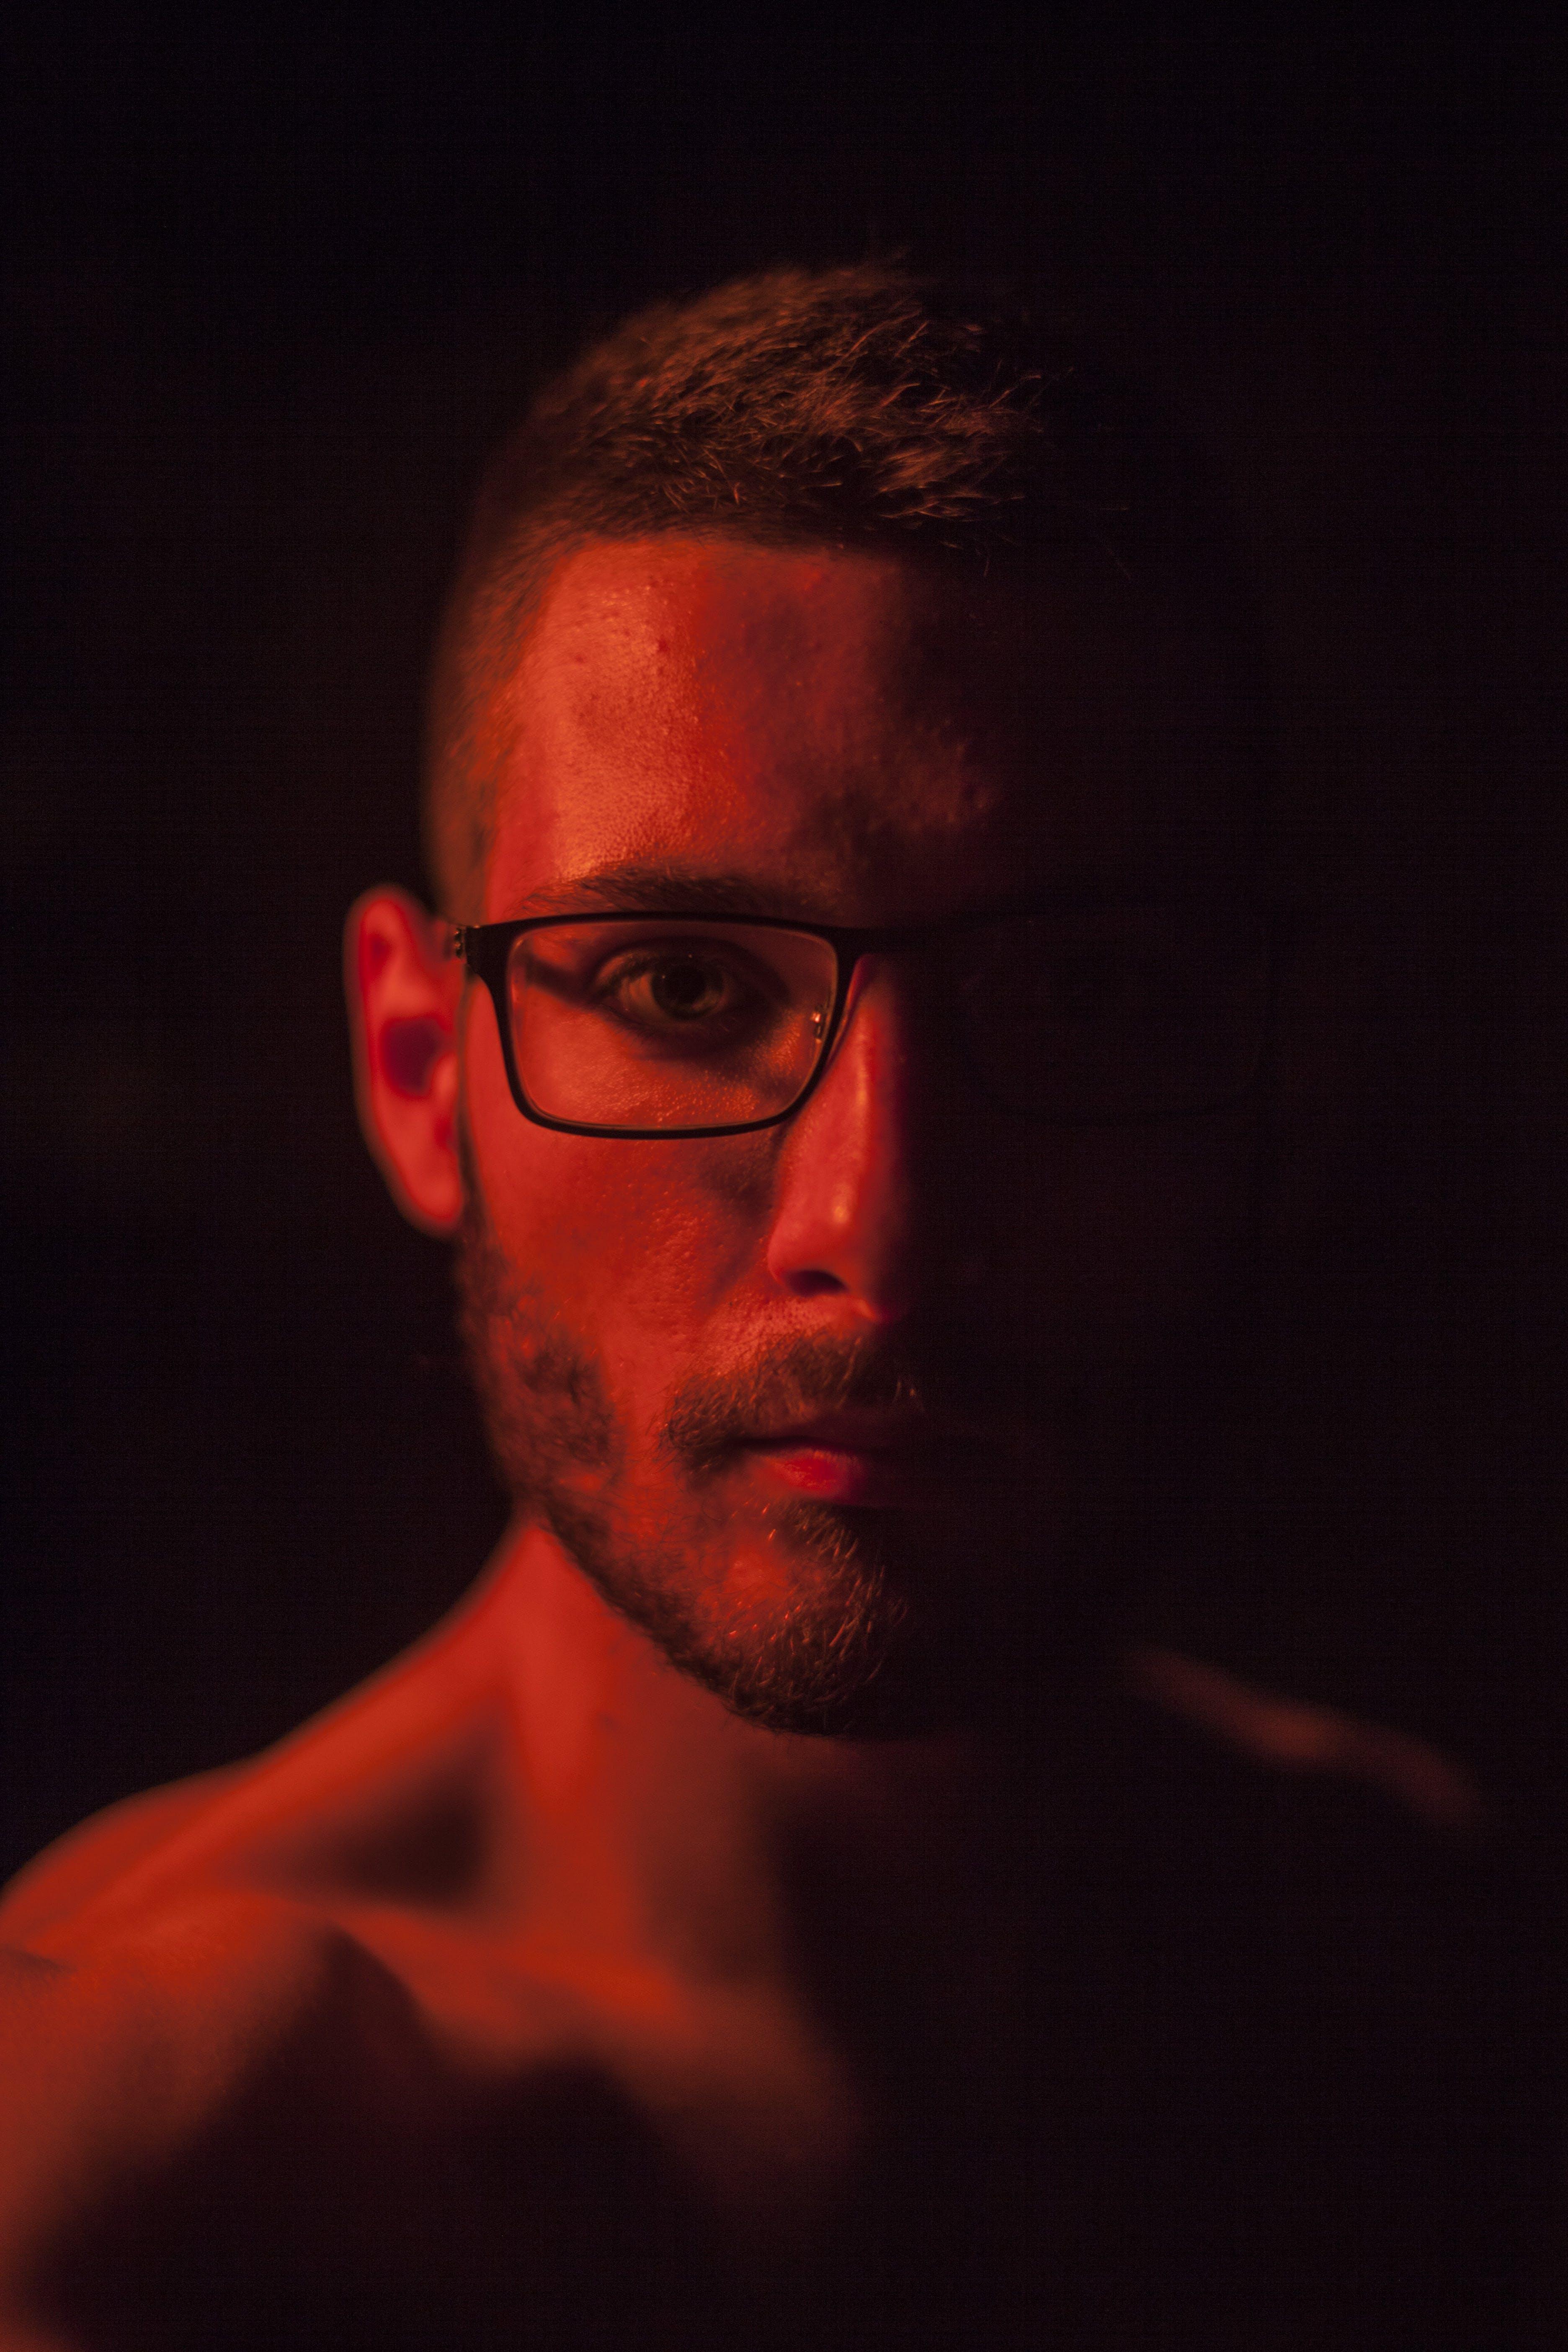 Man With Beard and Black Framed Eyeglasses